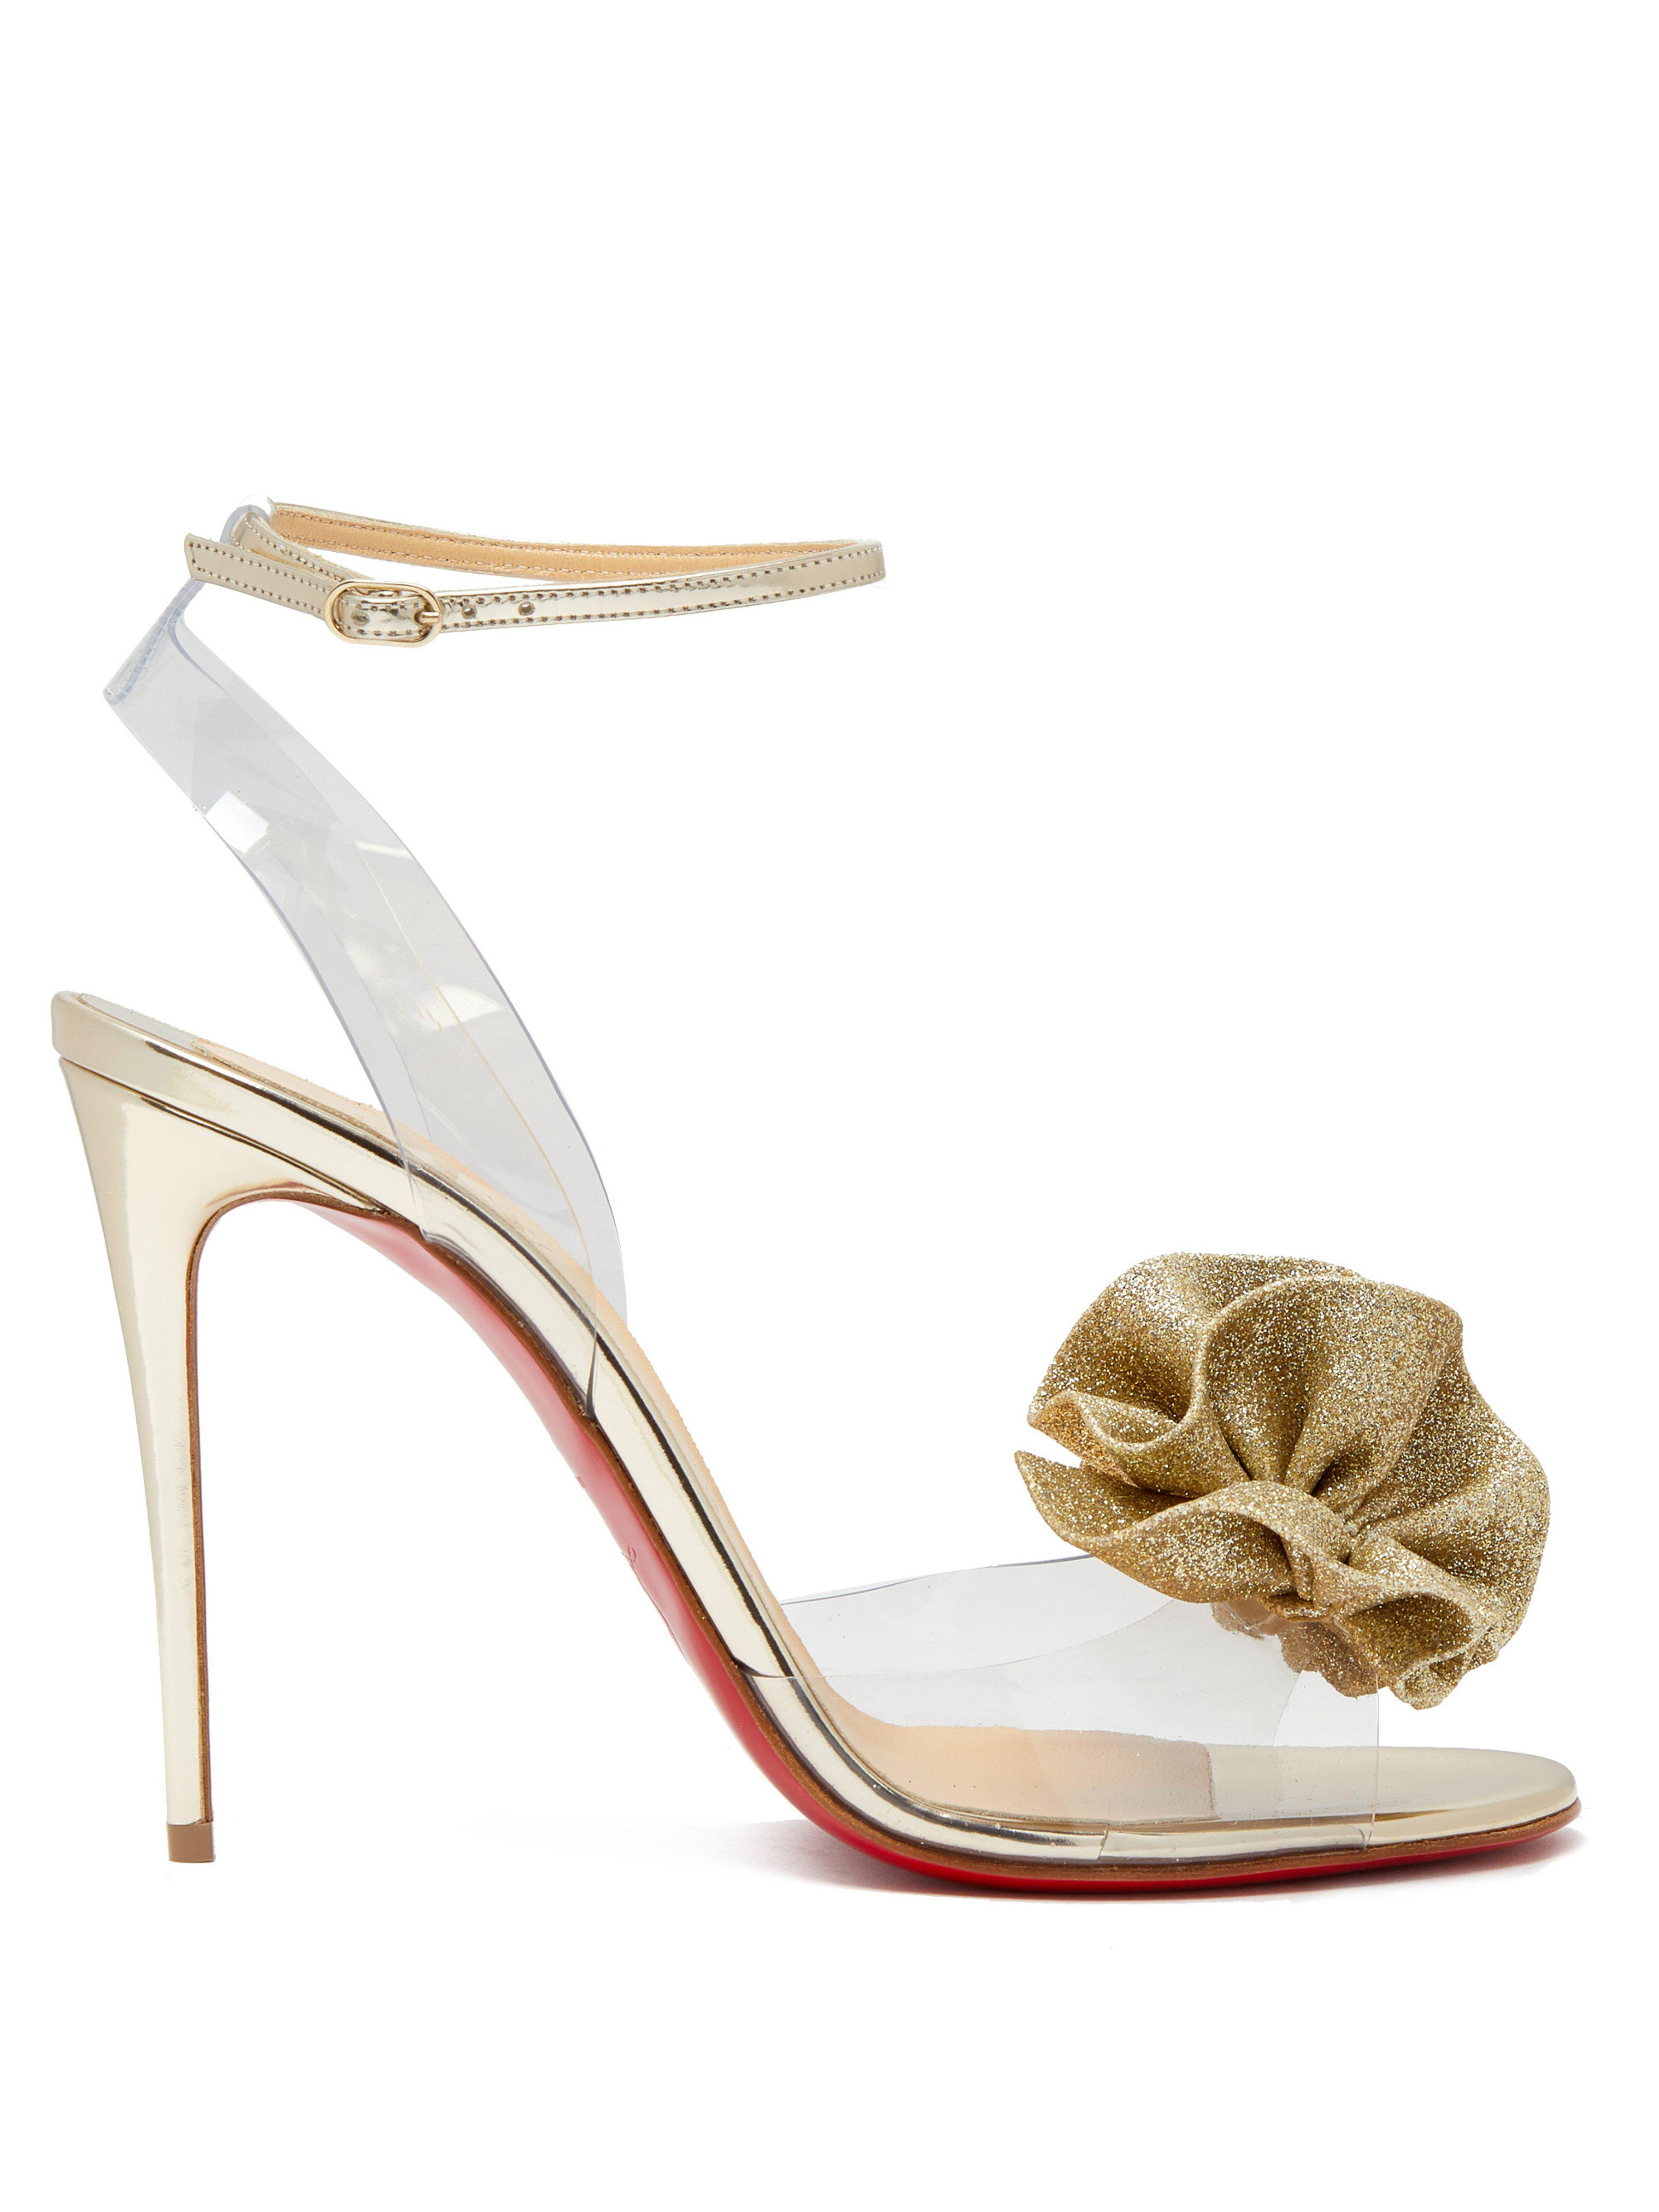 5d6b520f843 Christian Louboutin. Women s Metallic Fossiliza 100 Flower Embellished  Sandals